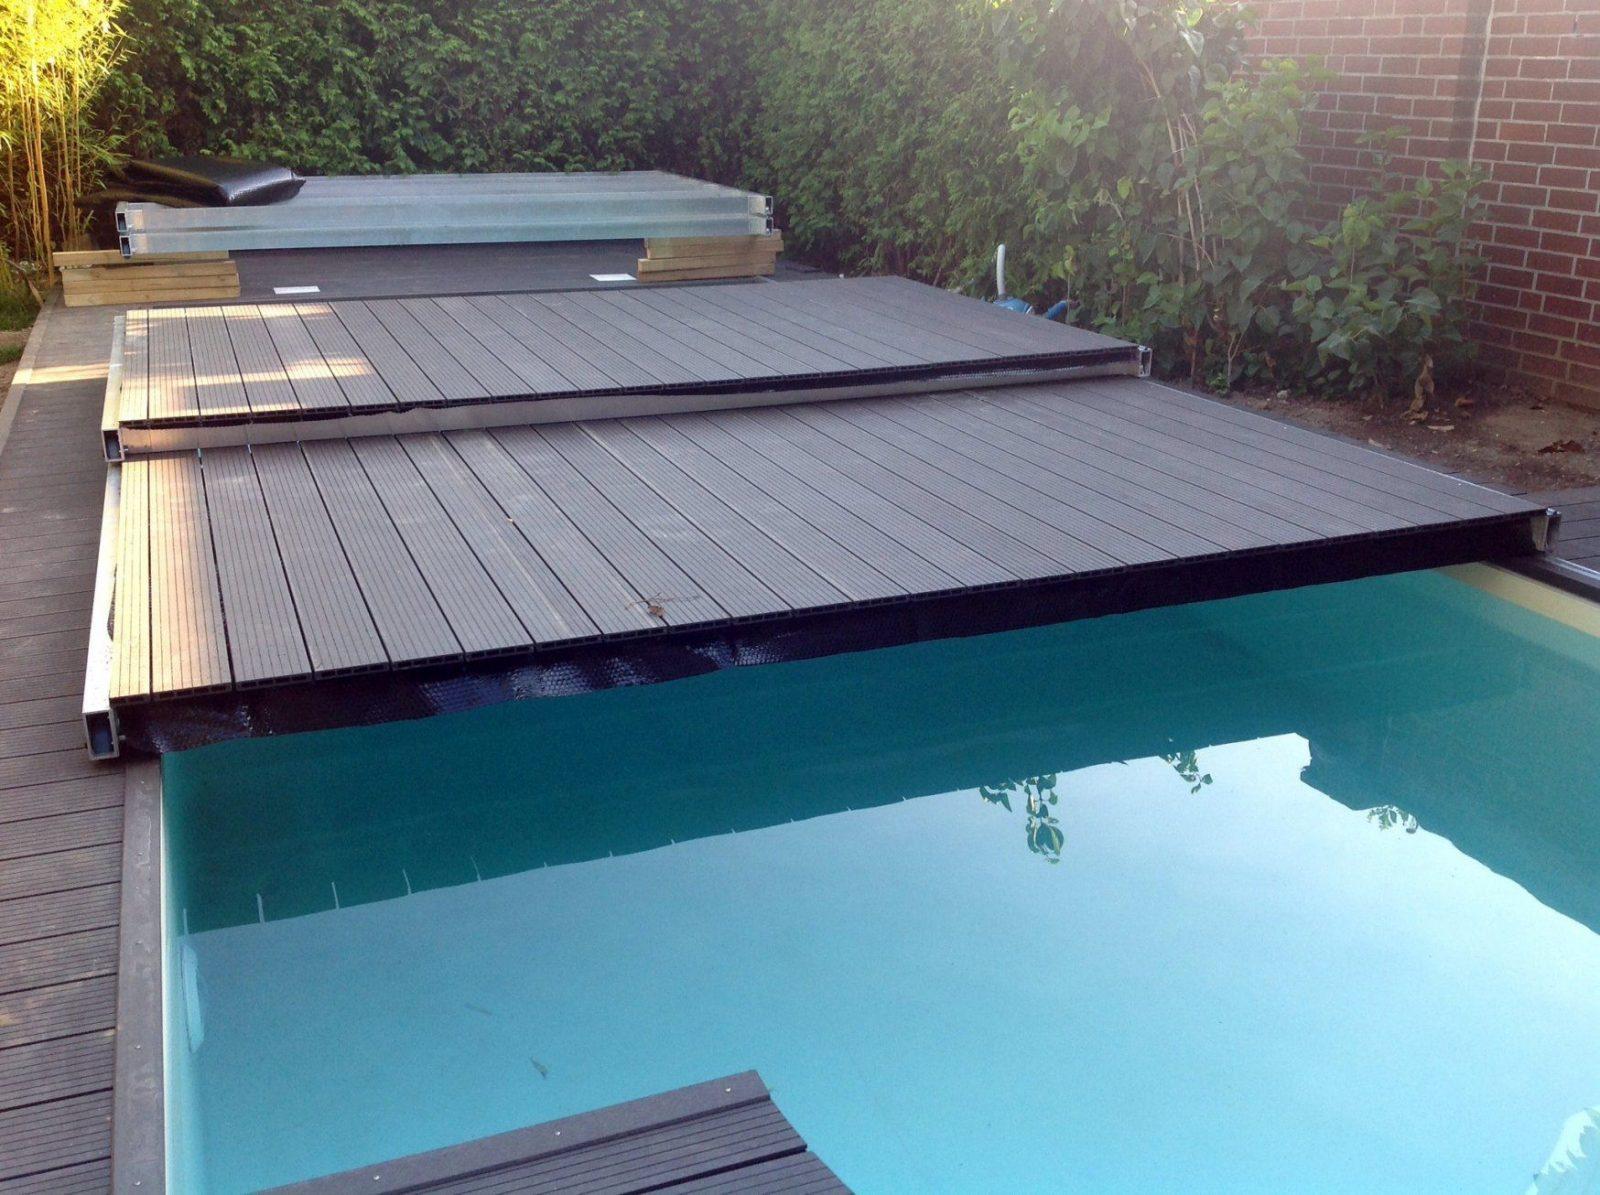 Pool Bauen Selber Hd66 – Hitoiro von Pool Podest Selber Bauen Photo